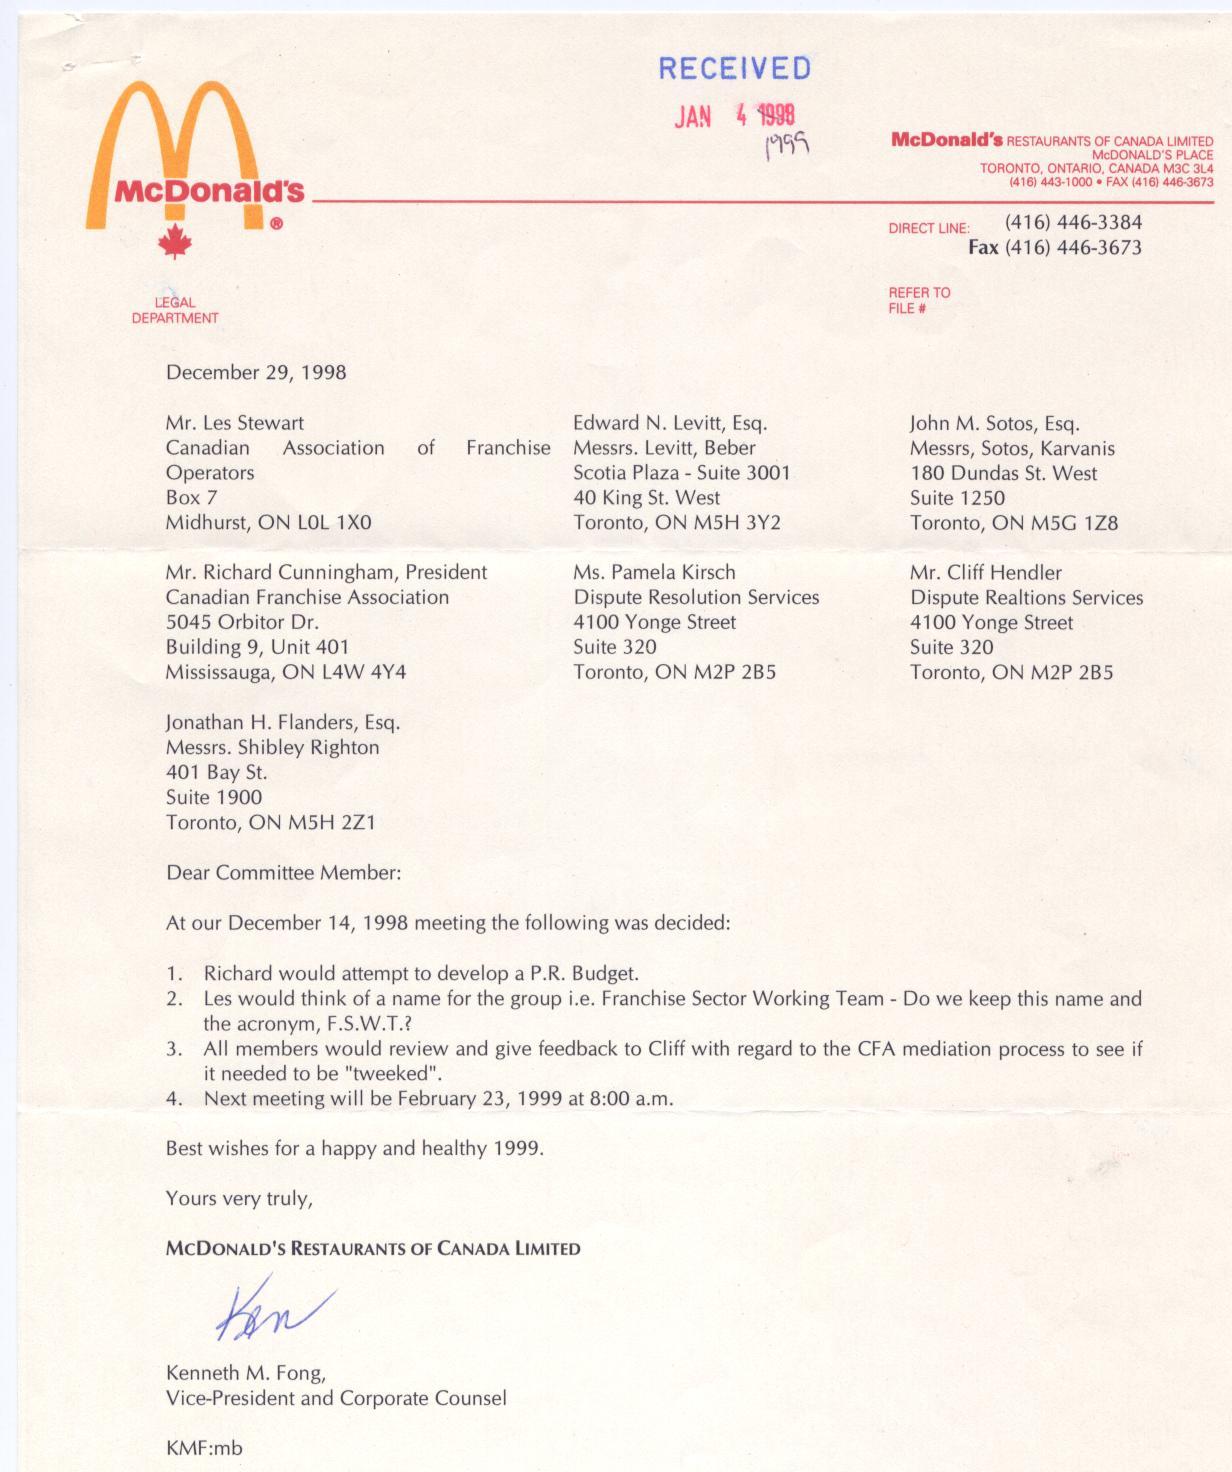 walmart job application canada form walmart assessment test and online